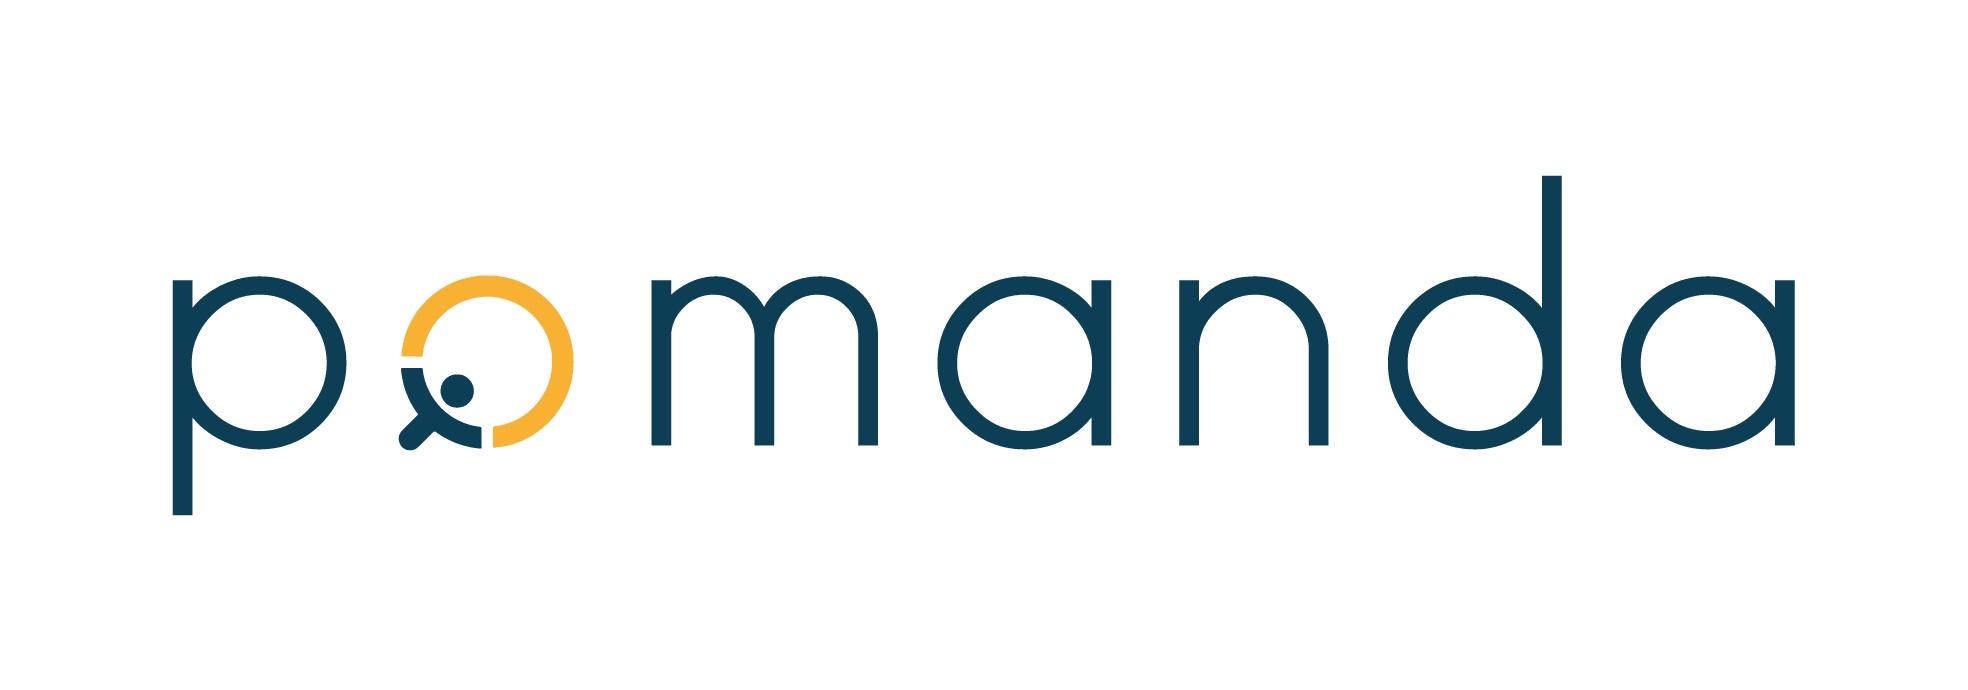 Pomanda logo